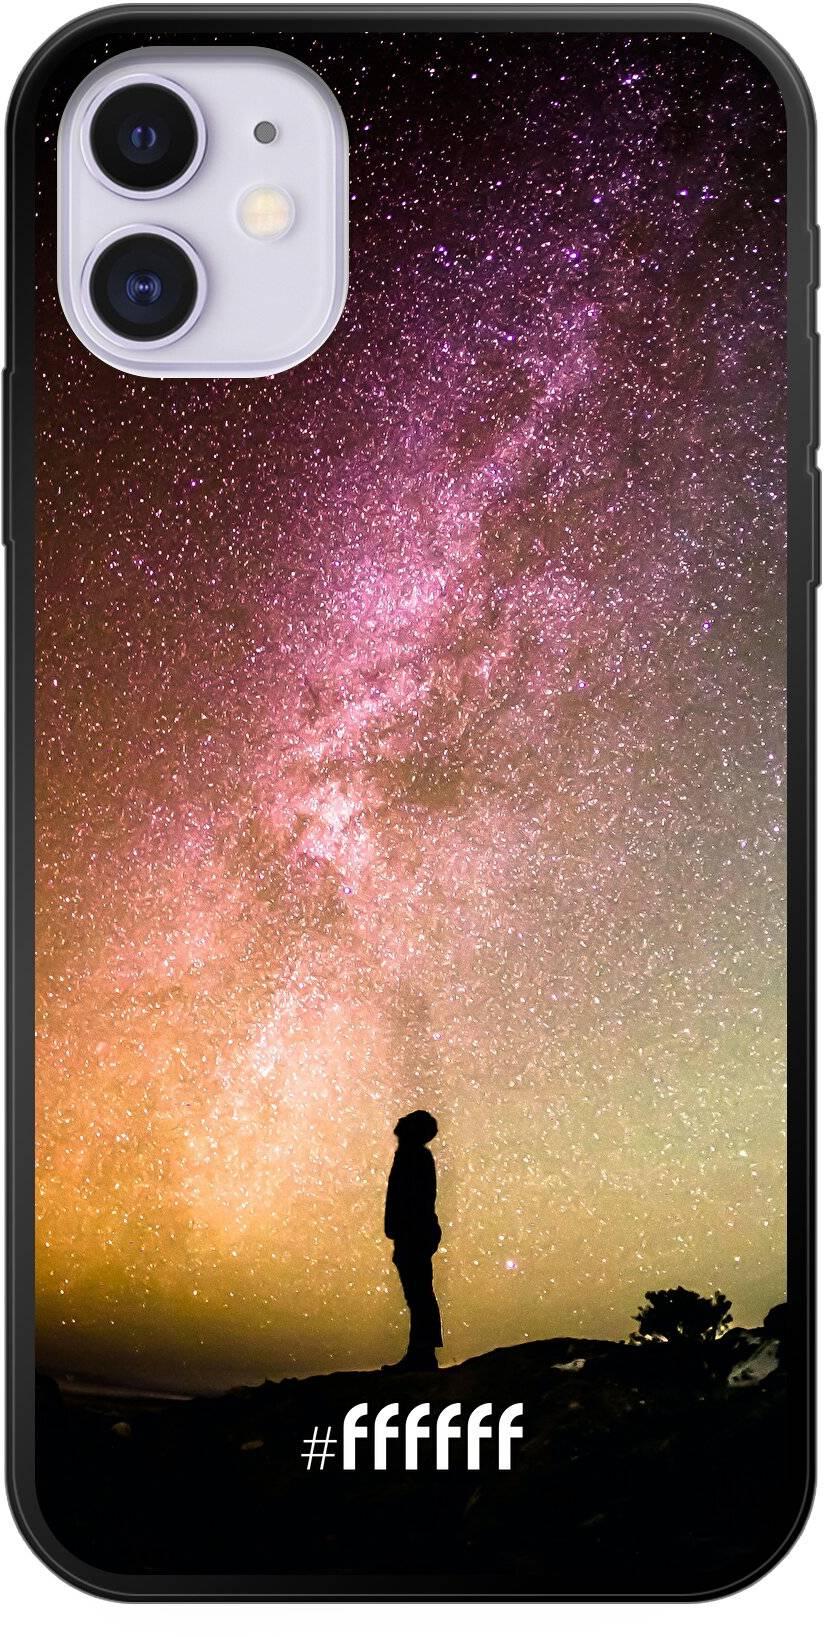 Watching the Stars iPhone 11